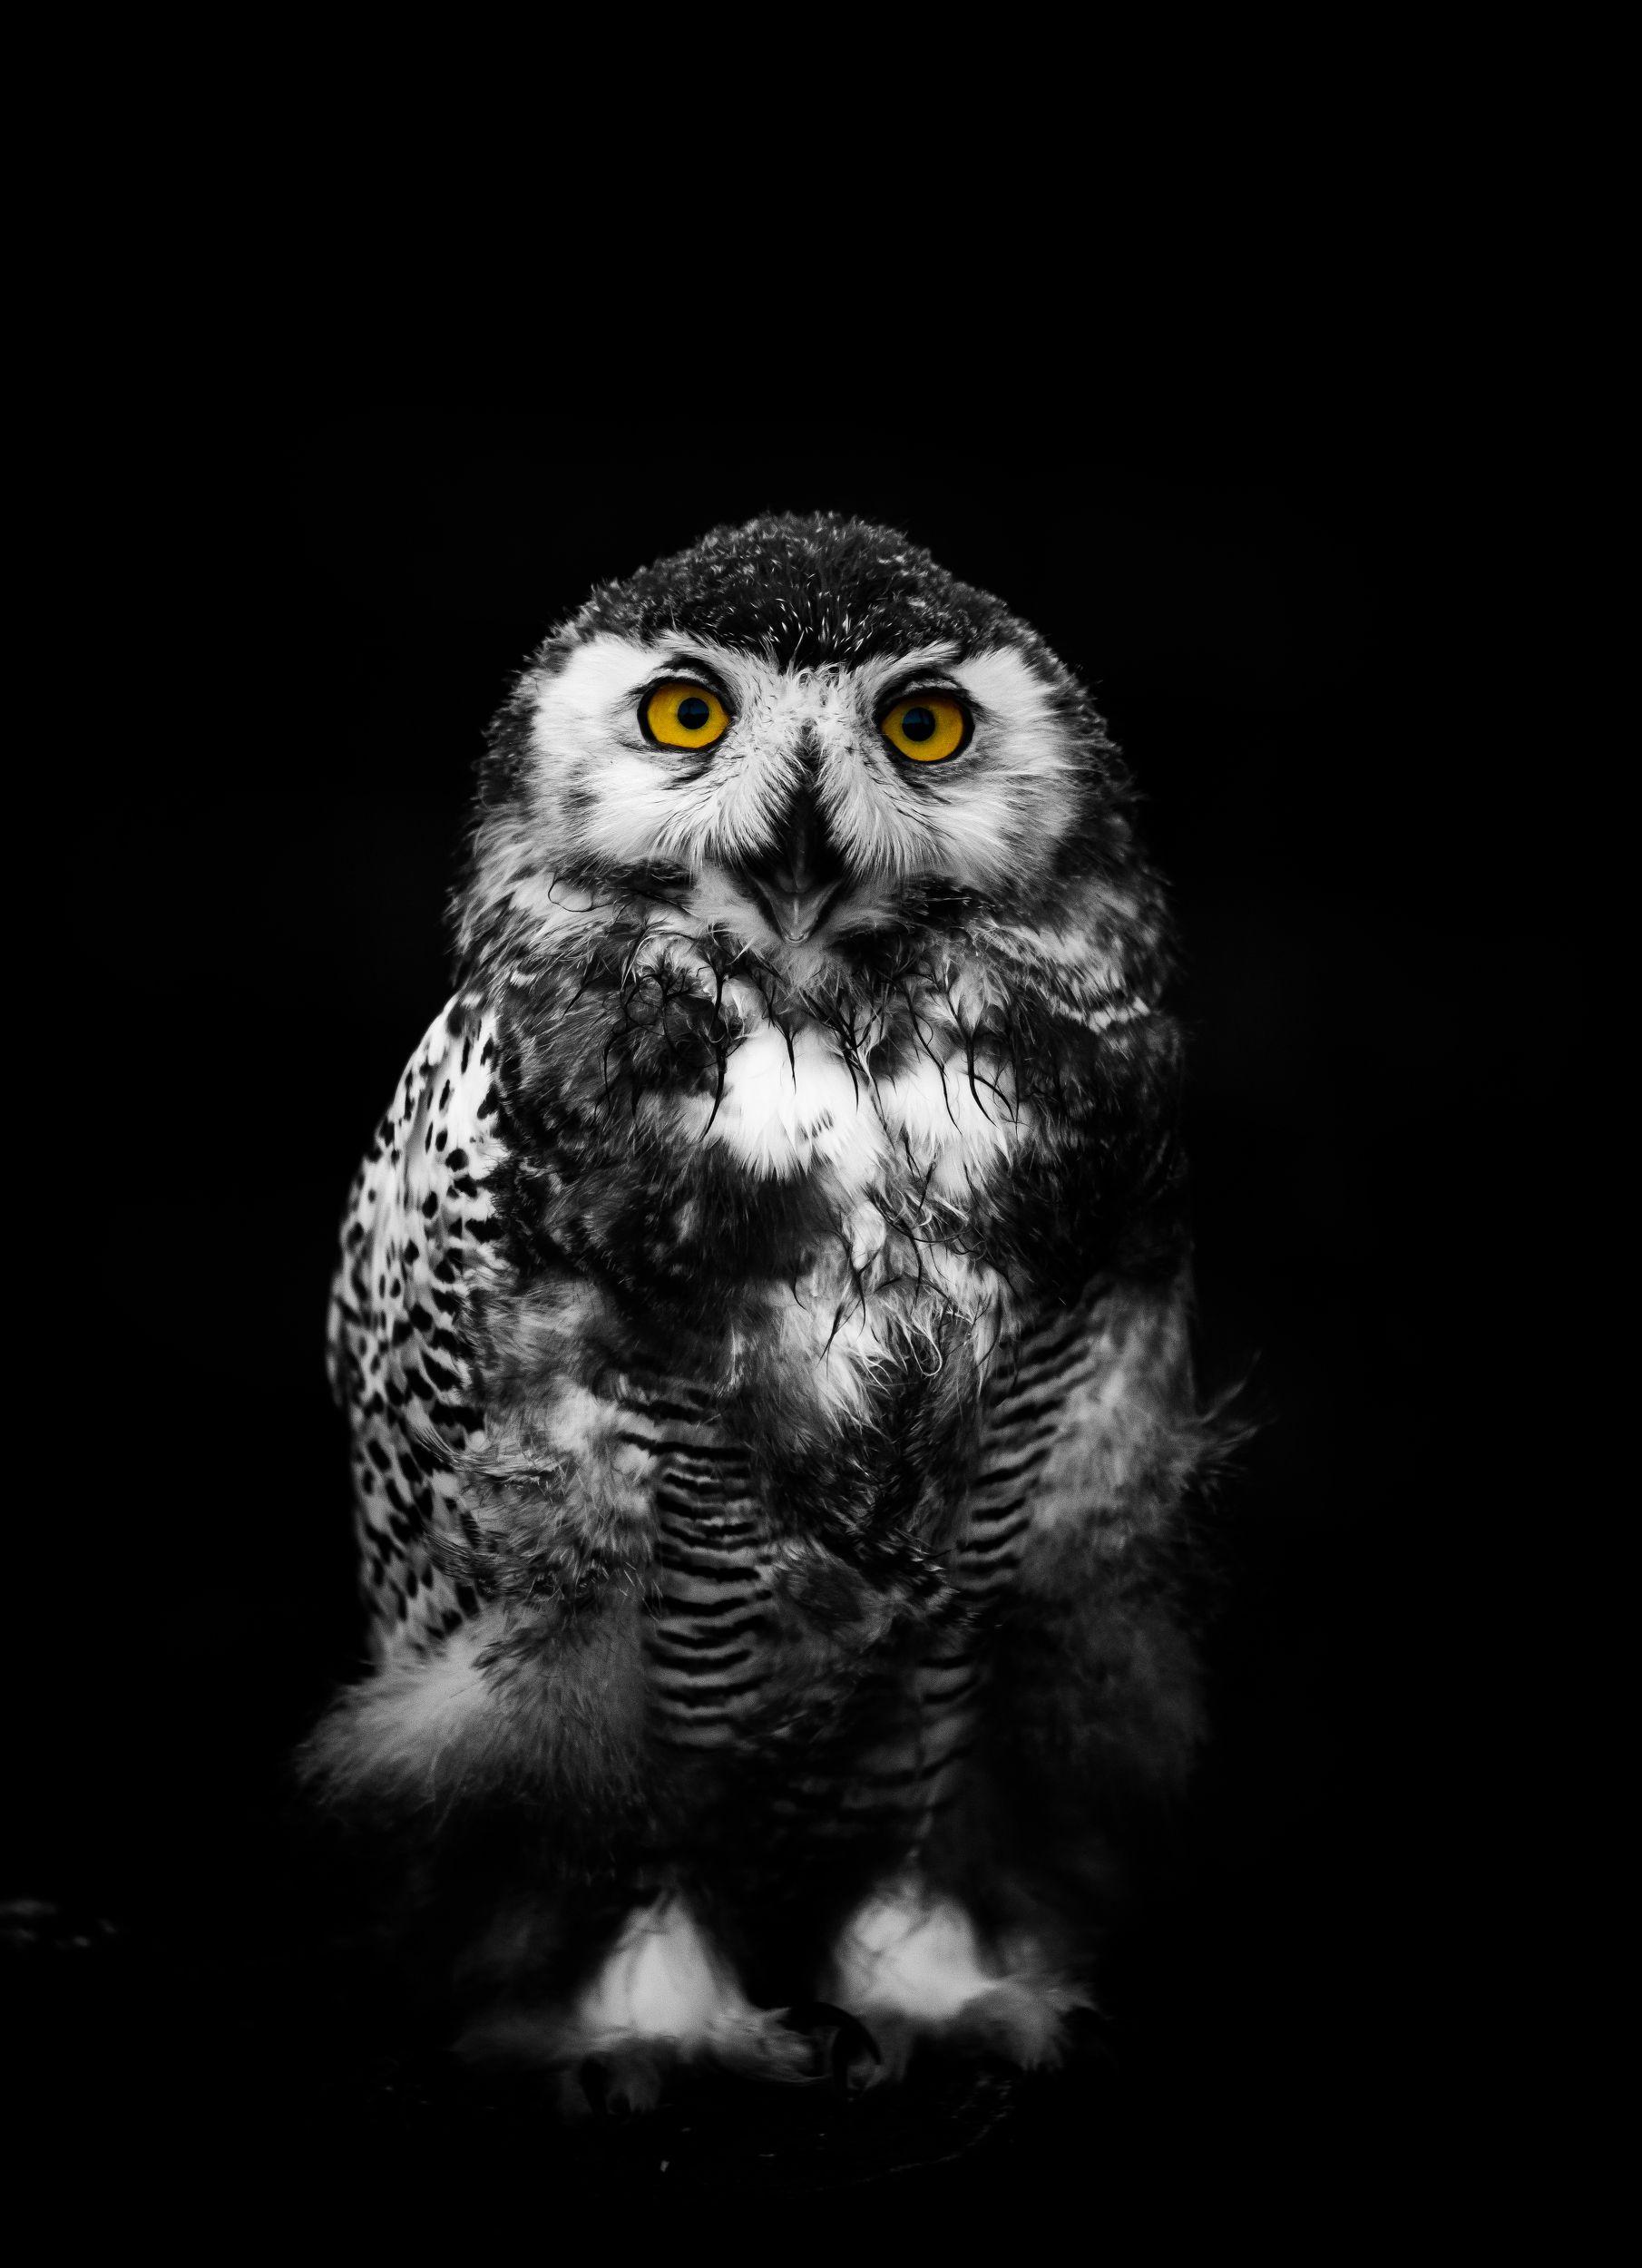 сова, птица, животное, анималистика, глаза, Даркина Дарья